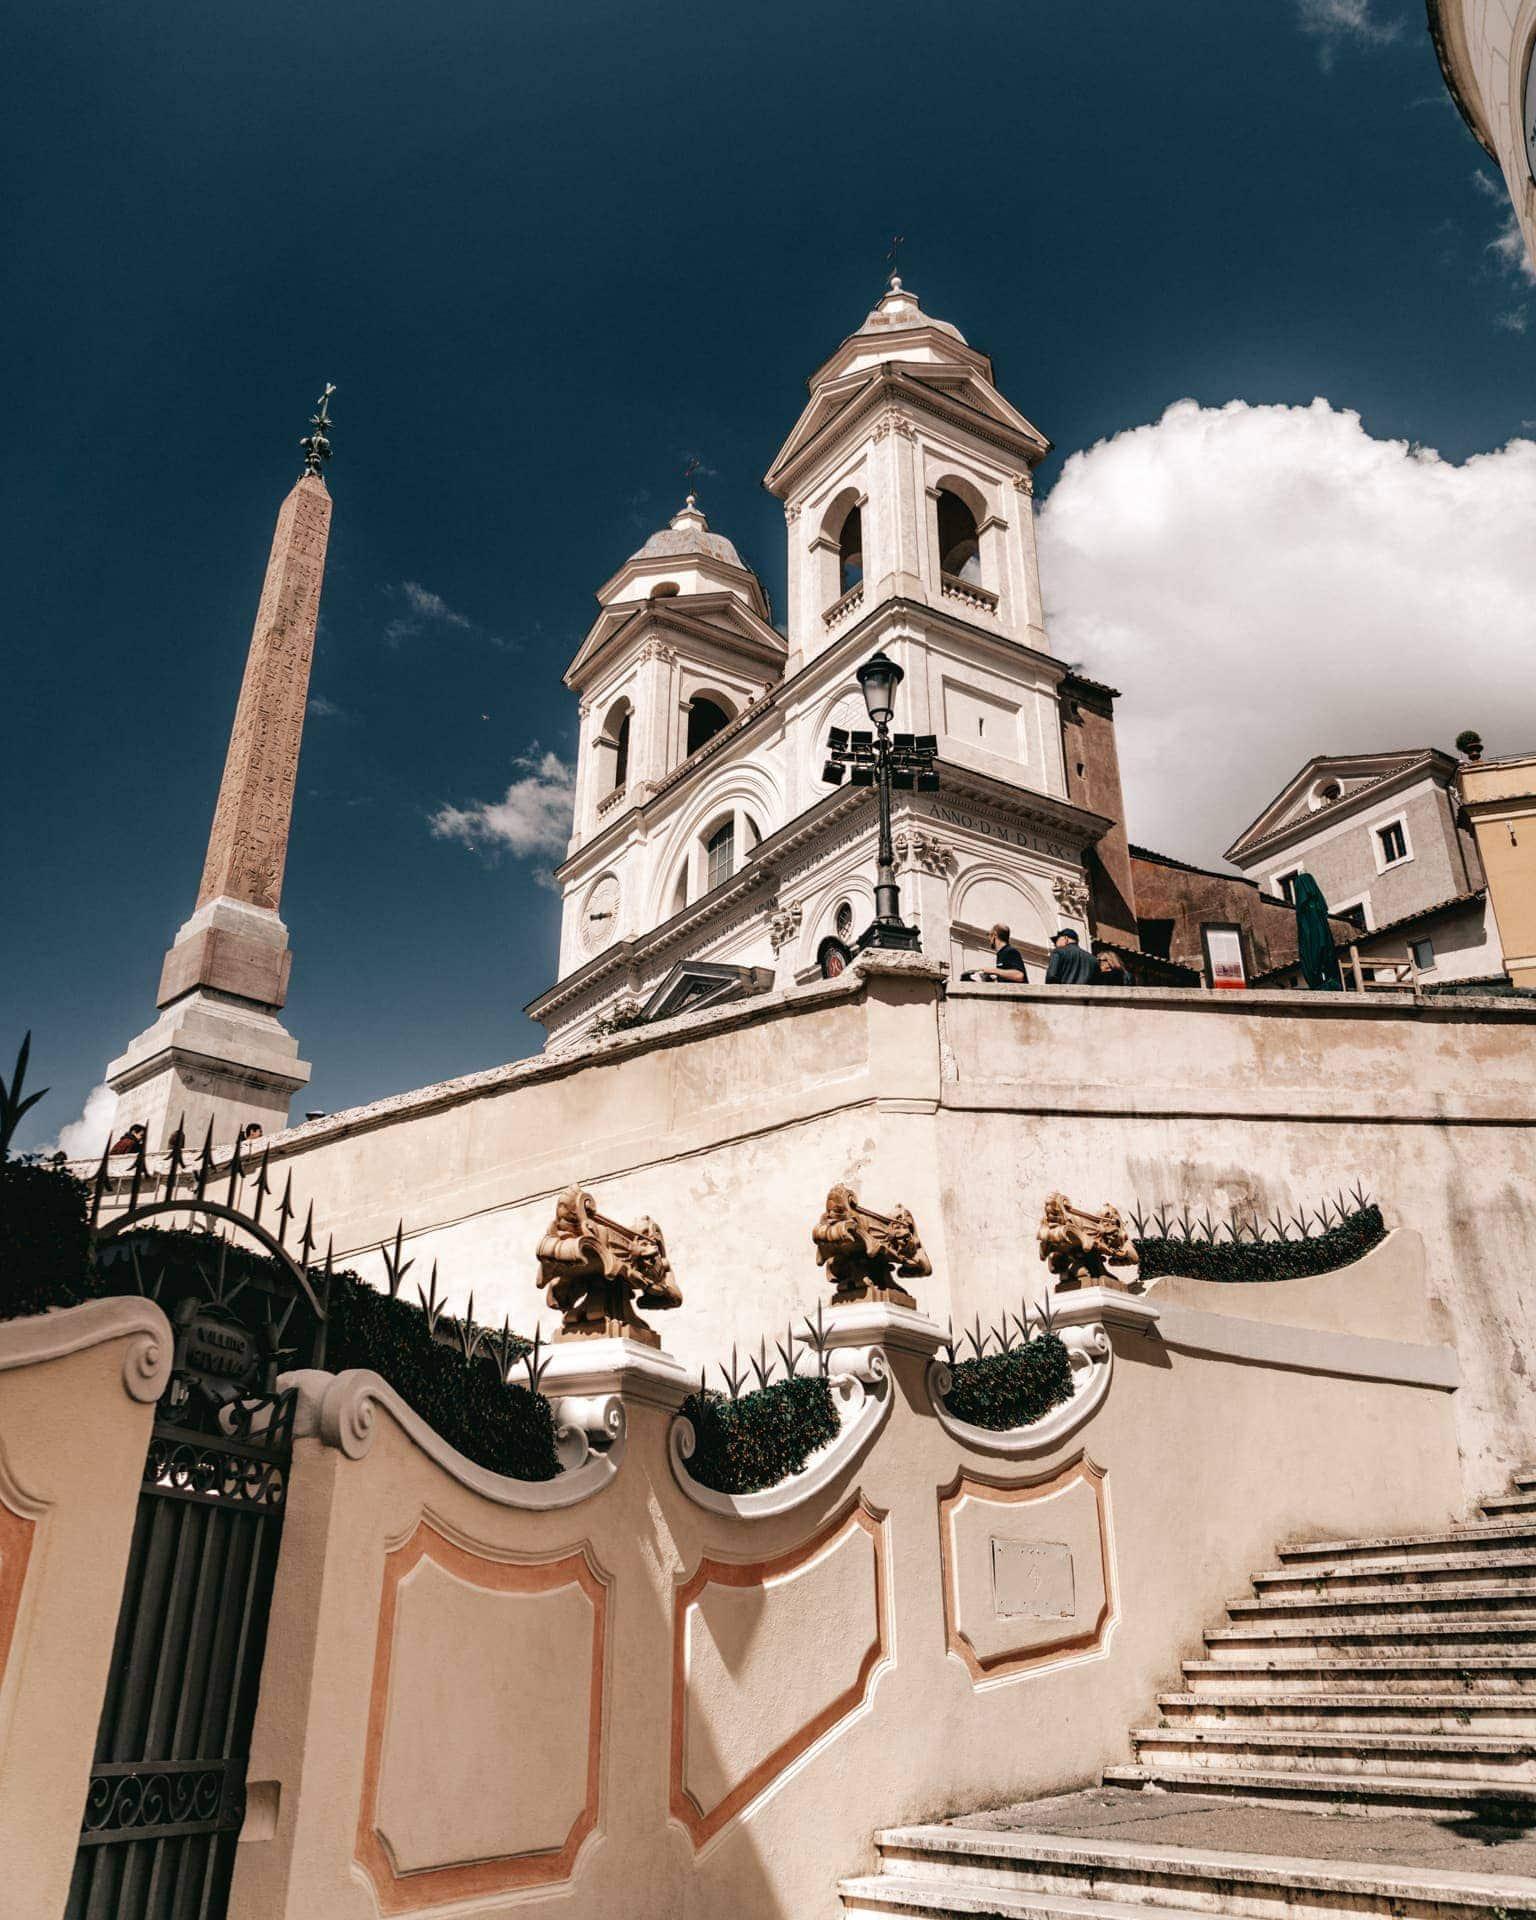 stedentrip rome Spaanse trappen